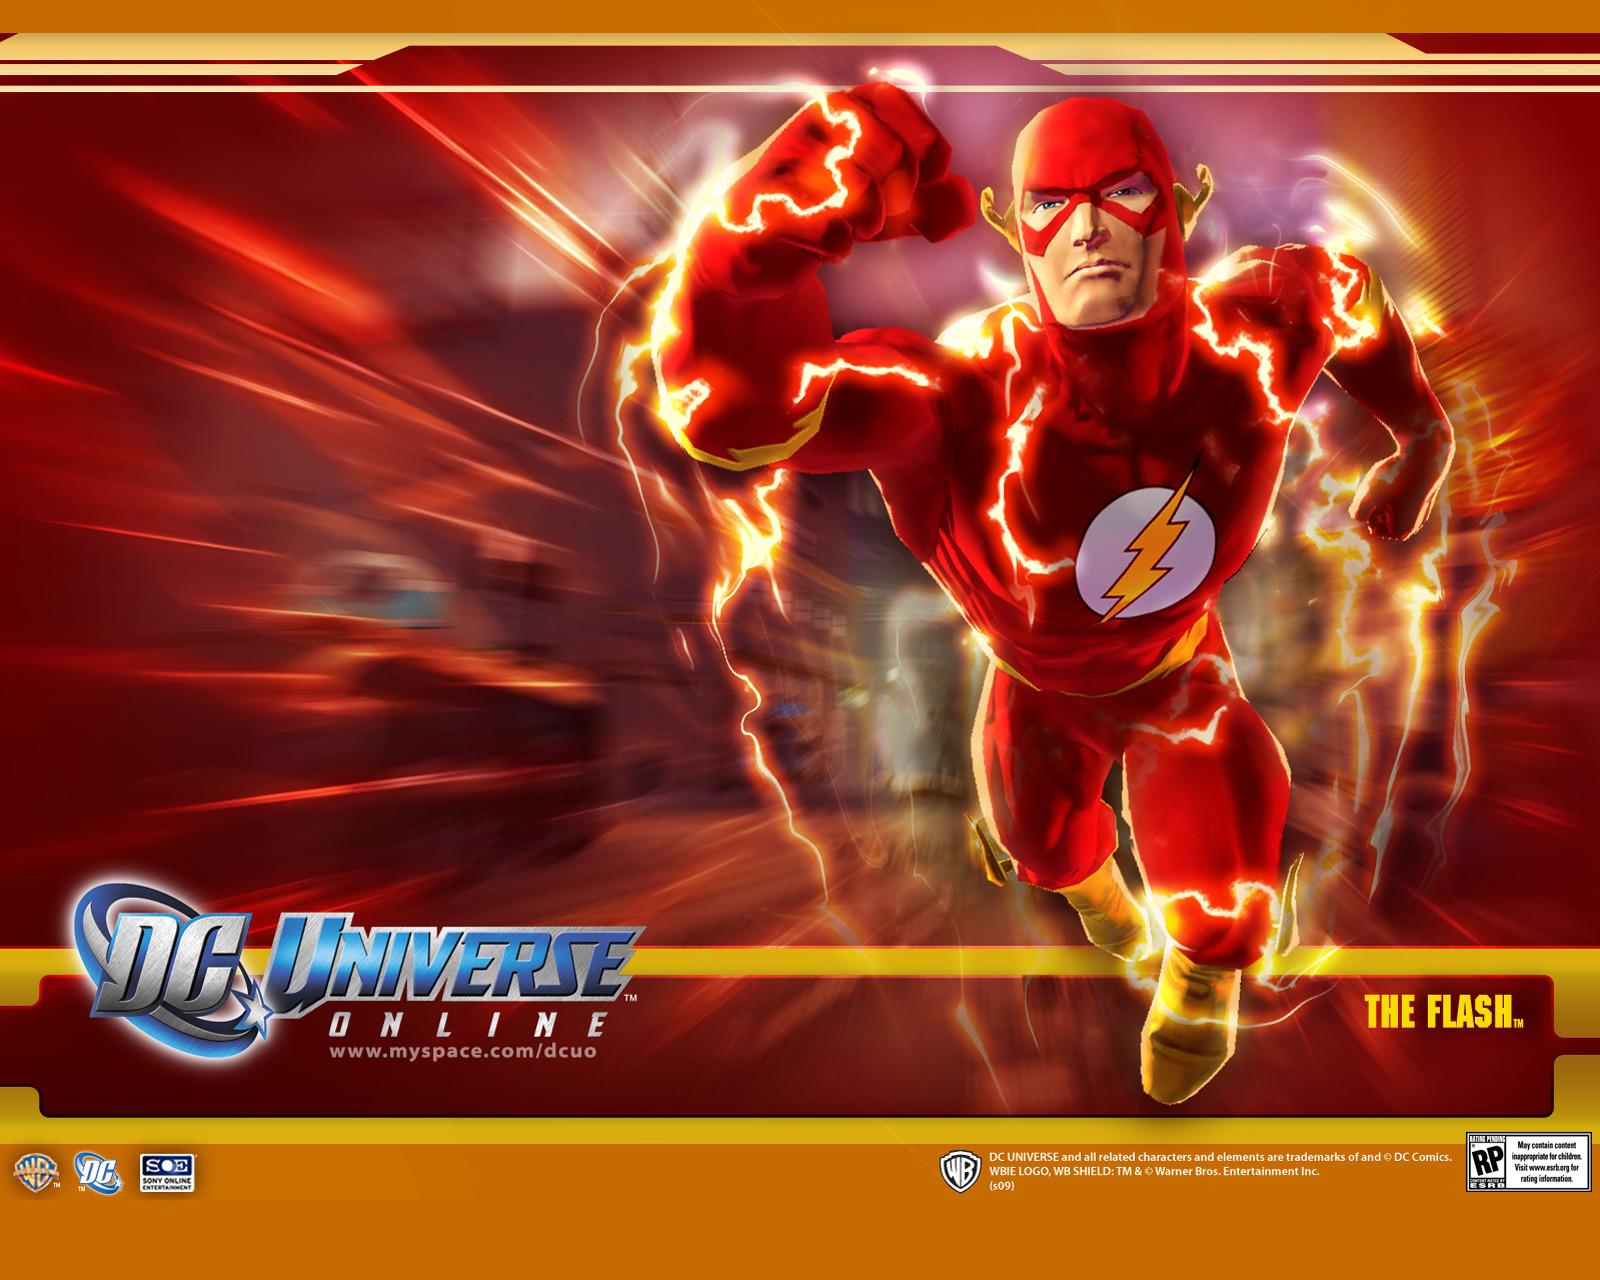 The Flash   DC Universe Online 1600x1280